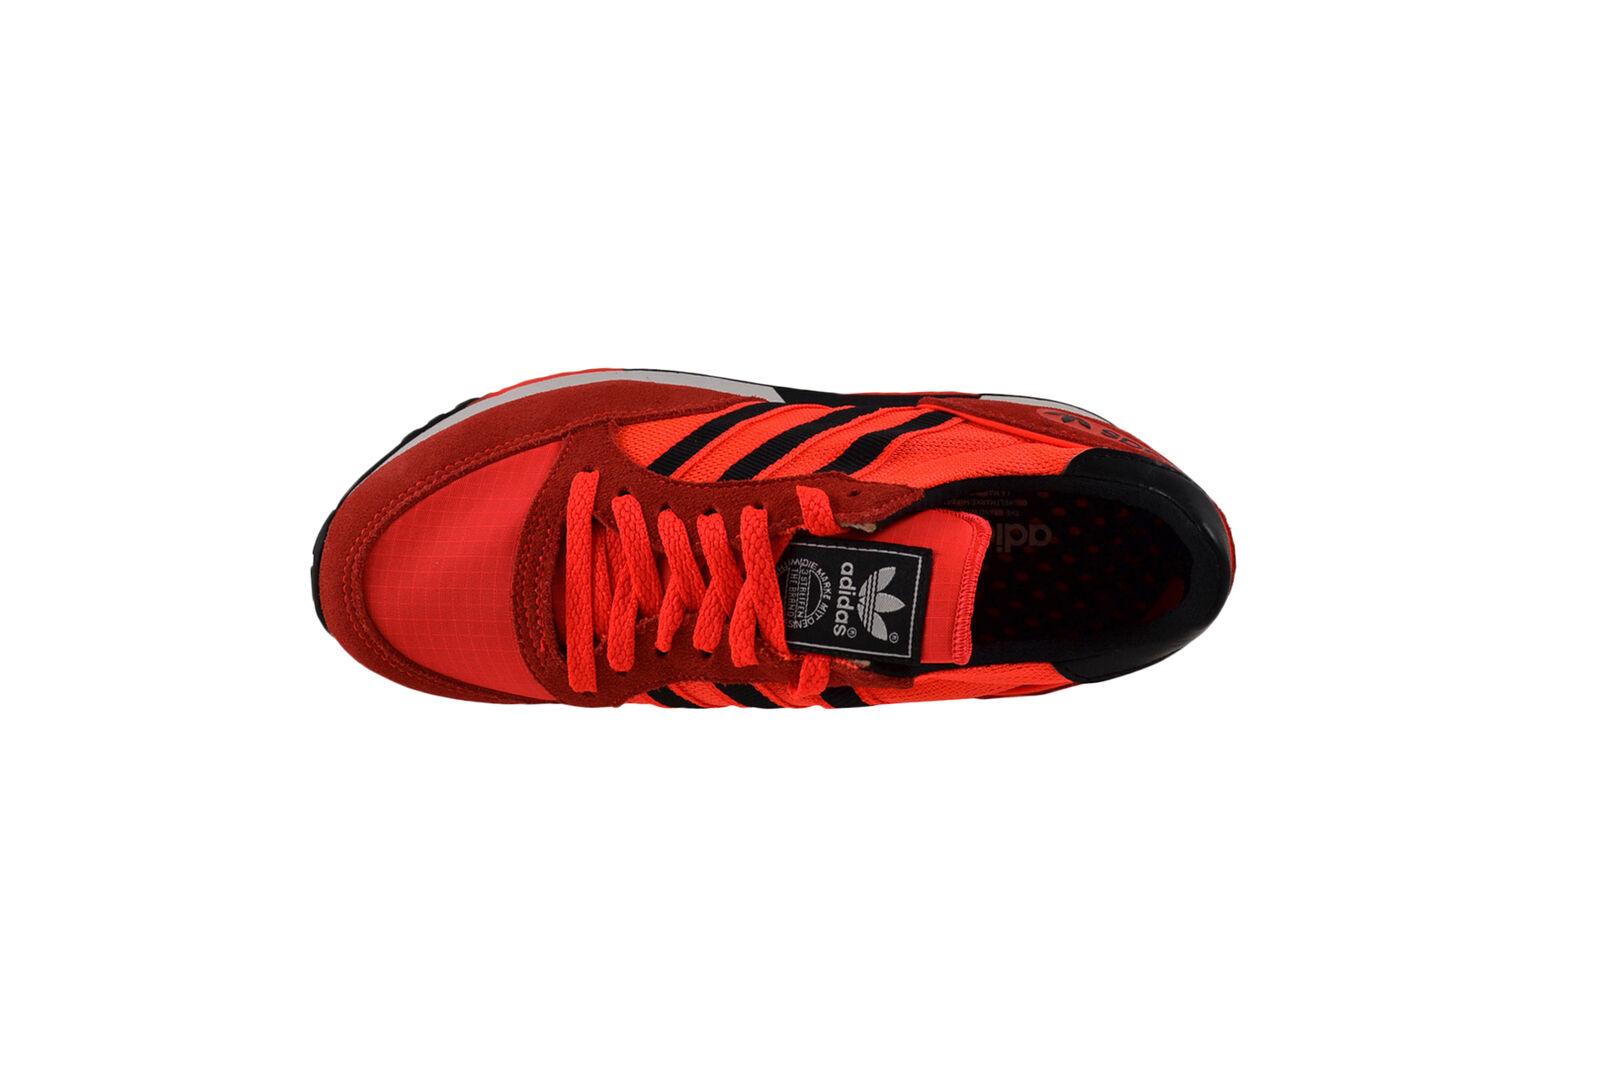 6de5c8324f94c ... Adidas phantom phantom phantom InfRouge /BLACK 1/whtvap Baskets/ chaussures rouge q23423